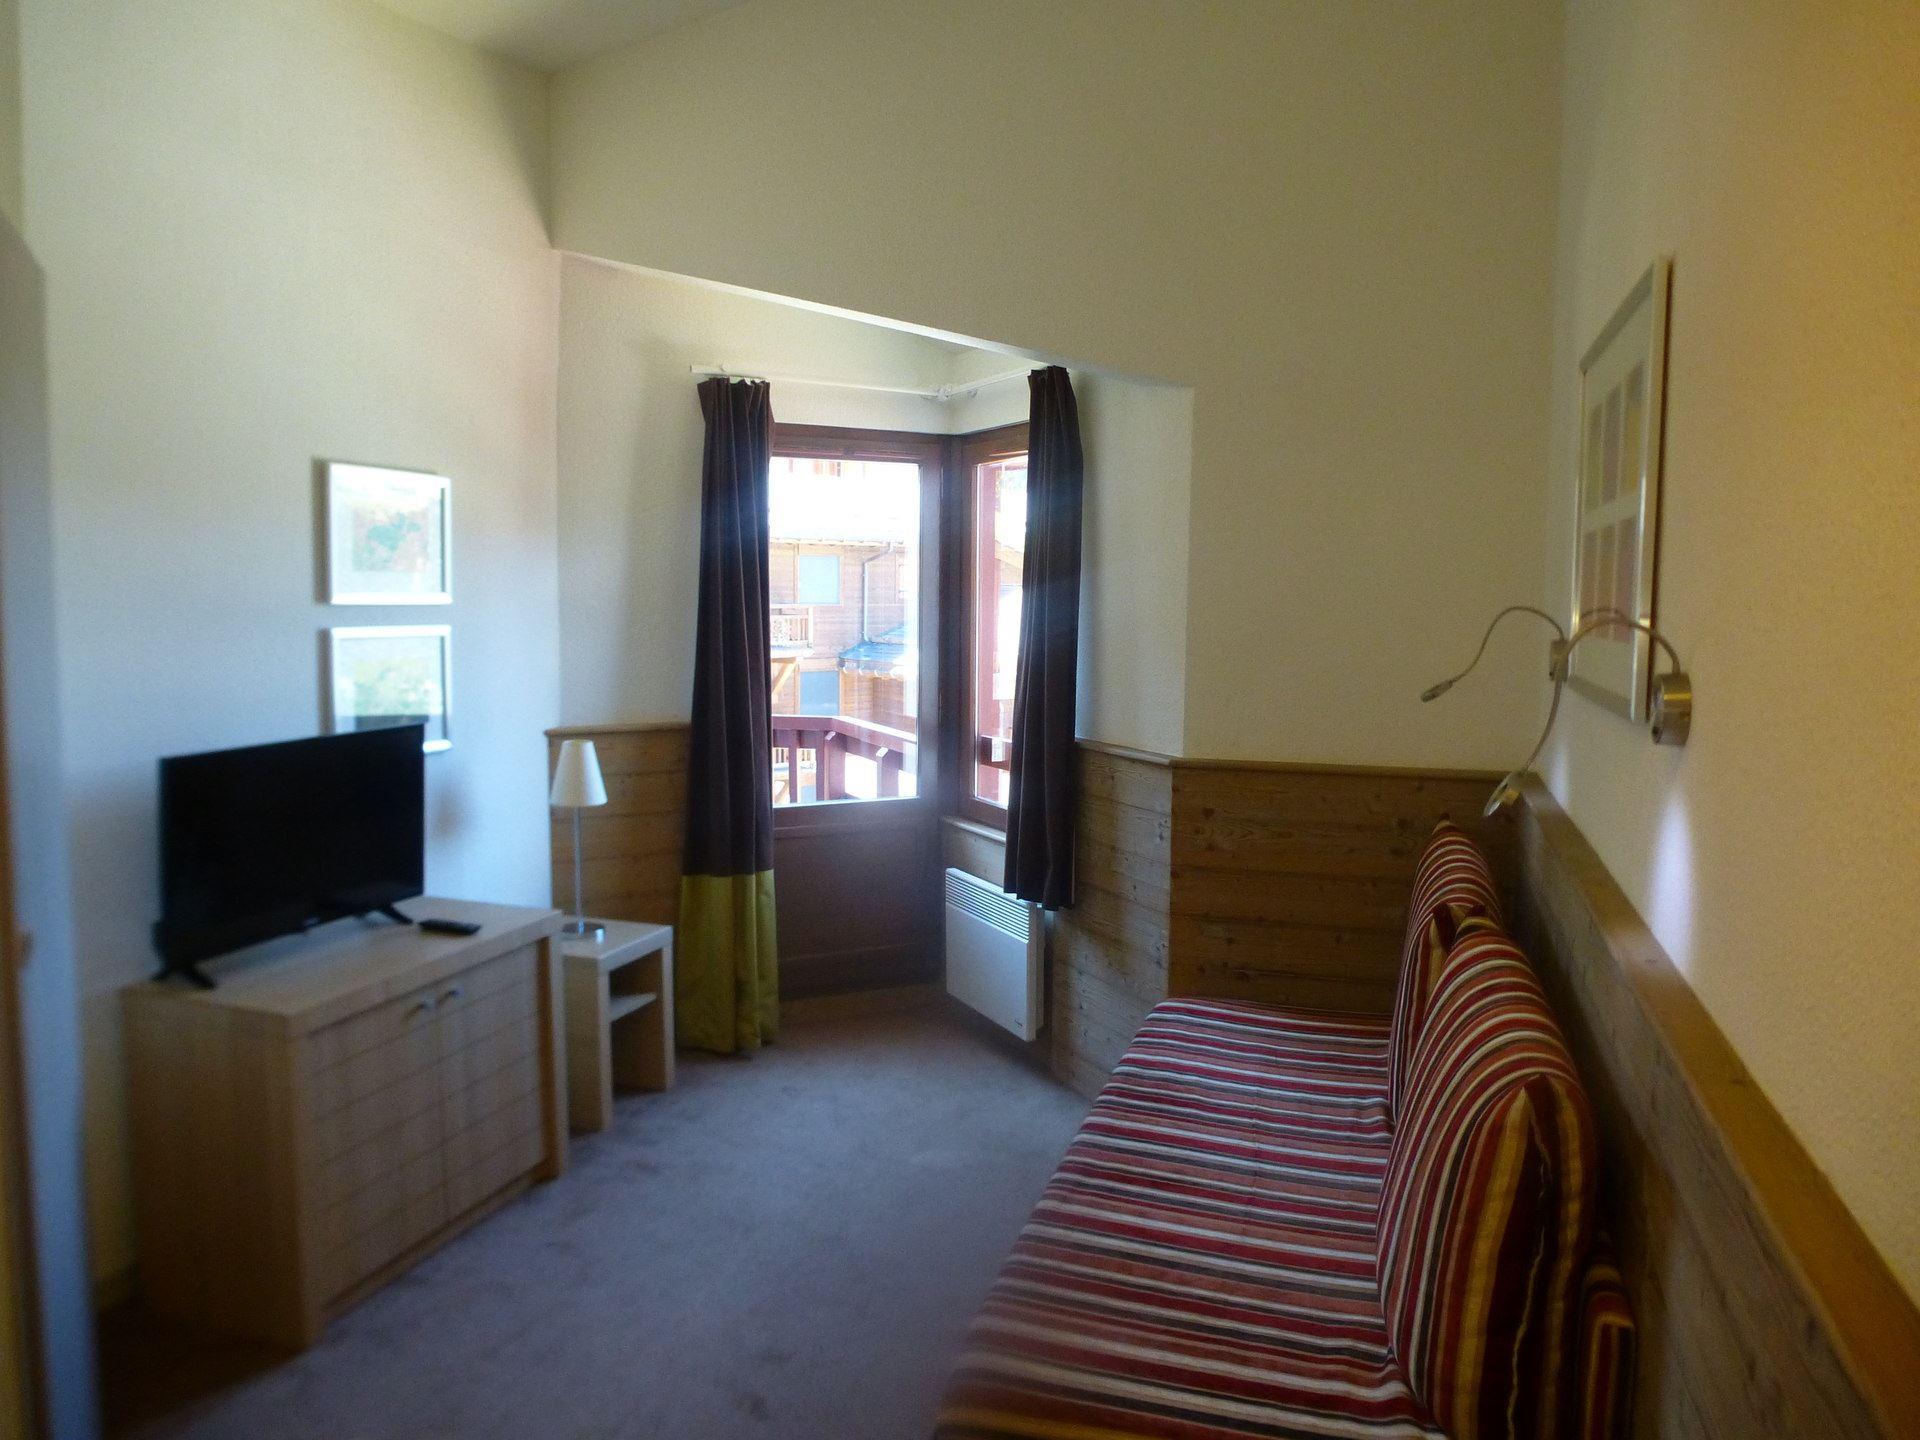 2 rooms, 4 people ski-in ski-out / Britania 602 (Mountain)